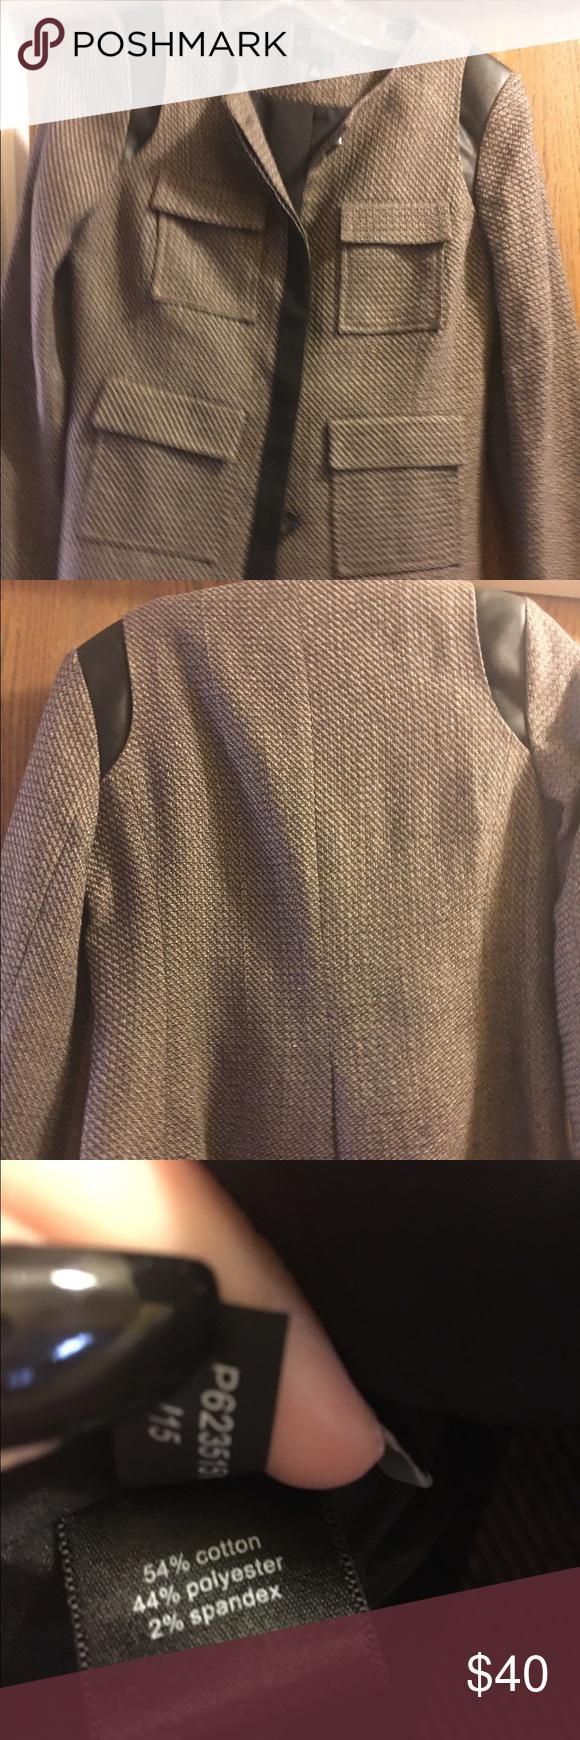 NEW The Limited brown blazer w leather detail XS Brand new never worn!  Beautiful blazer!! The Limited Jackets & Coats Blazers